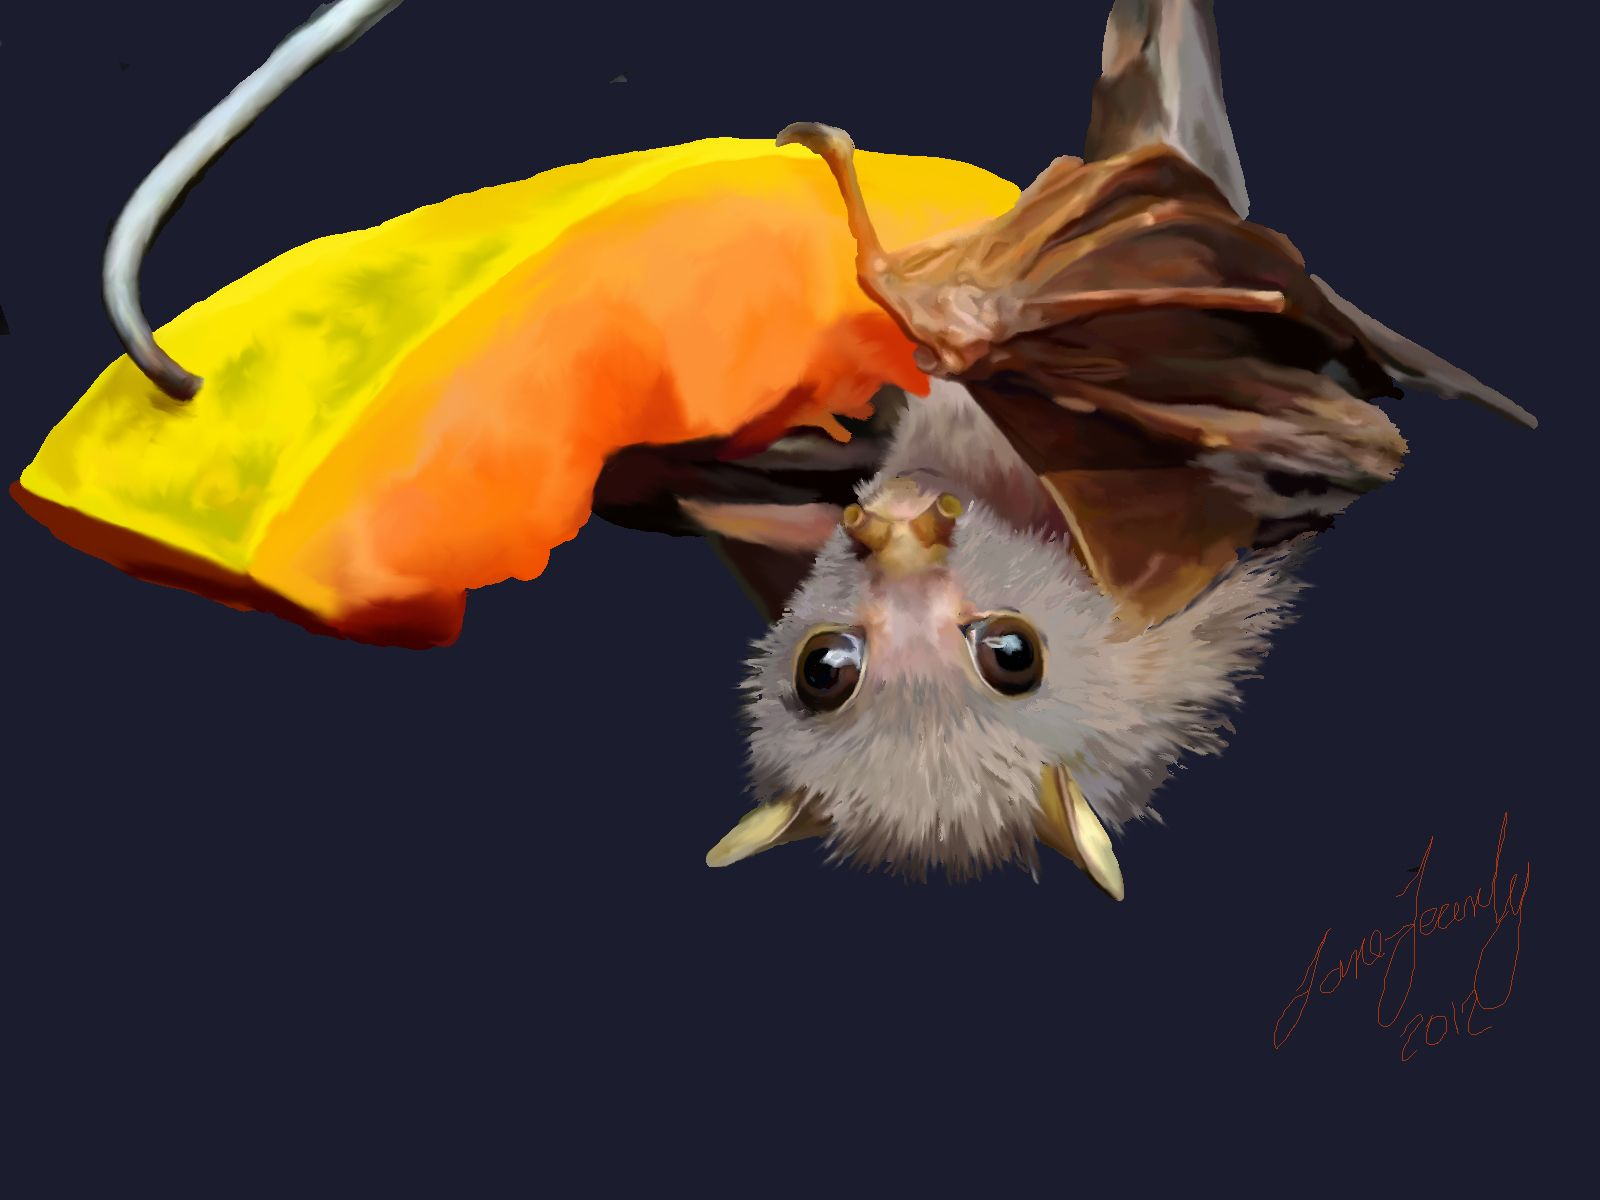 Art, Baby bat eating melon | Baby bats, Cute bat, All bat